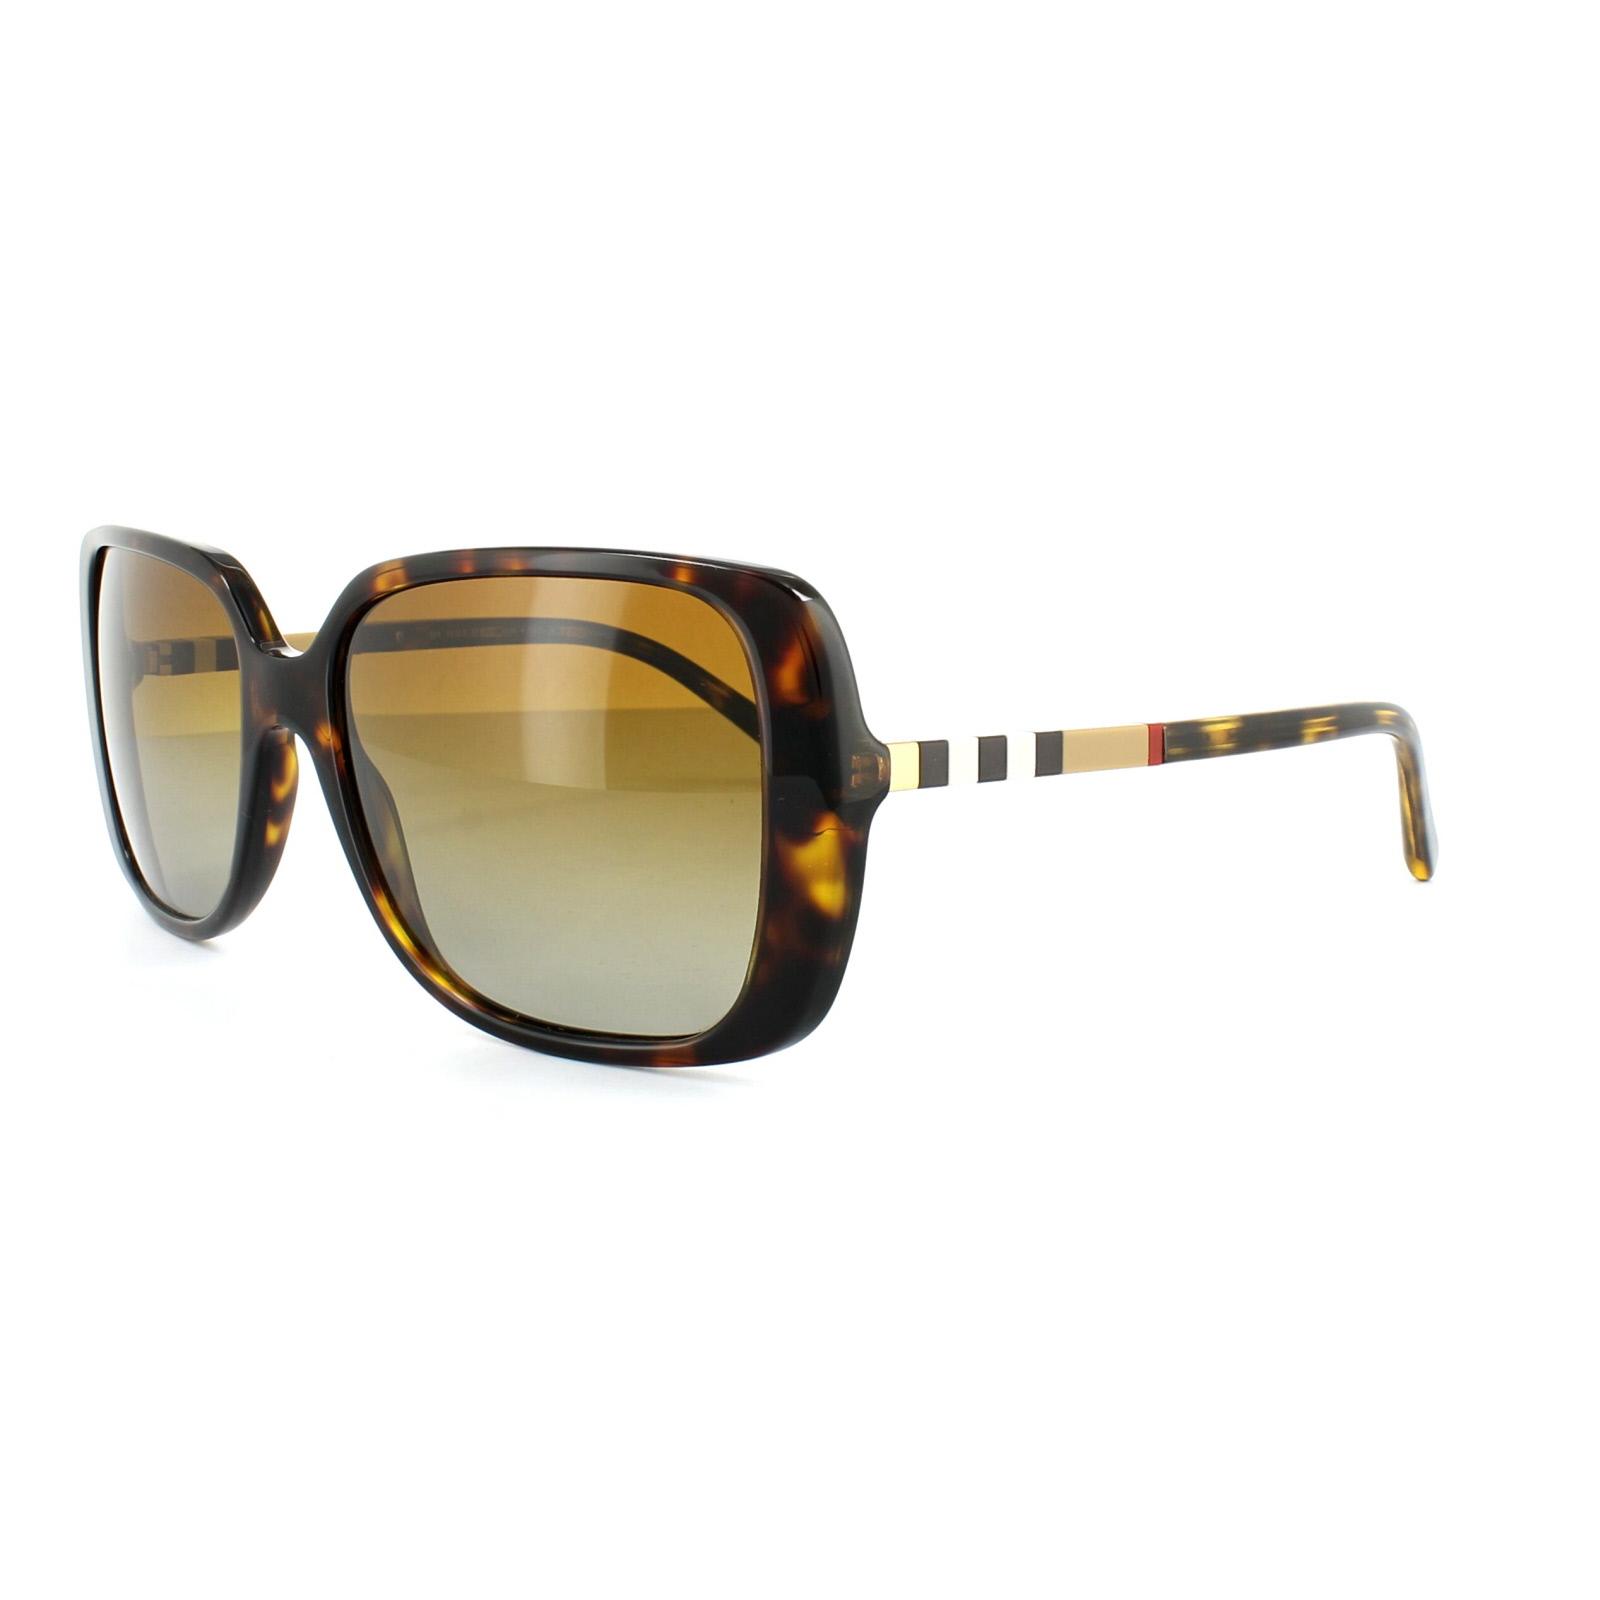 Polarized Burberry Sunglasses  burberry sunglasses 4198 3002t5 dark havana brown grant